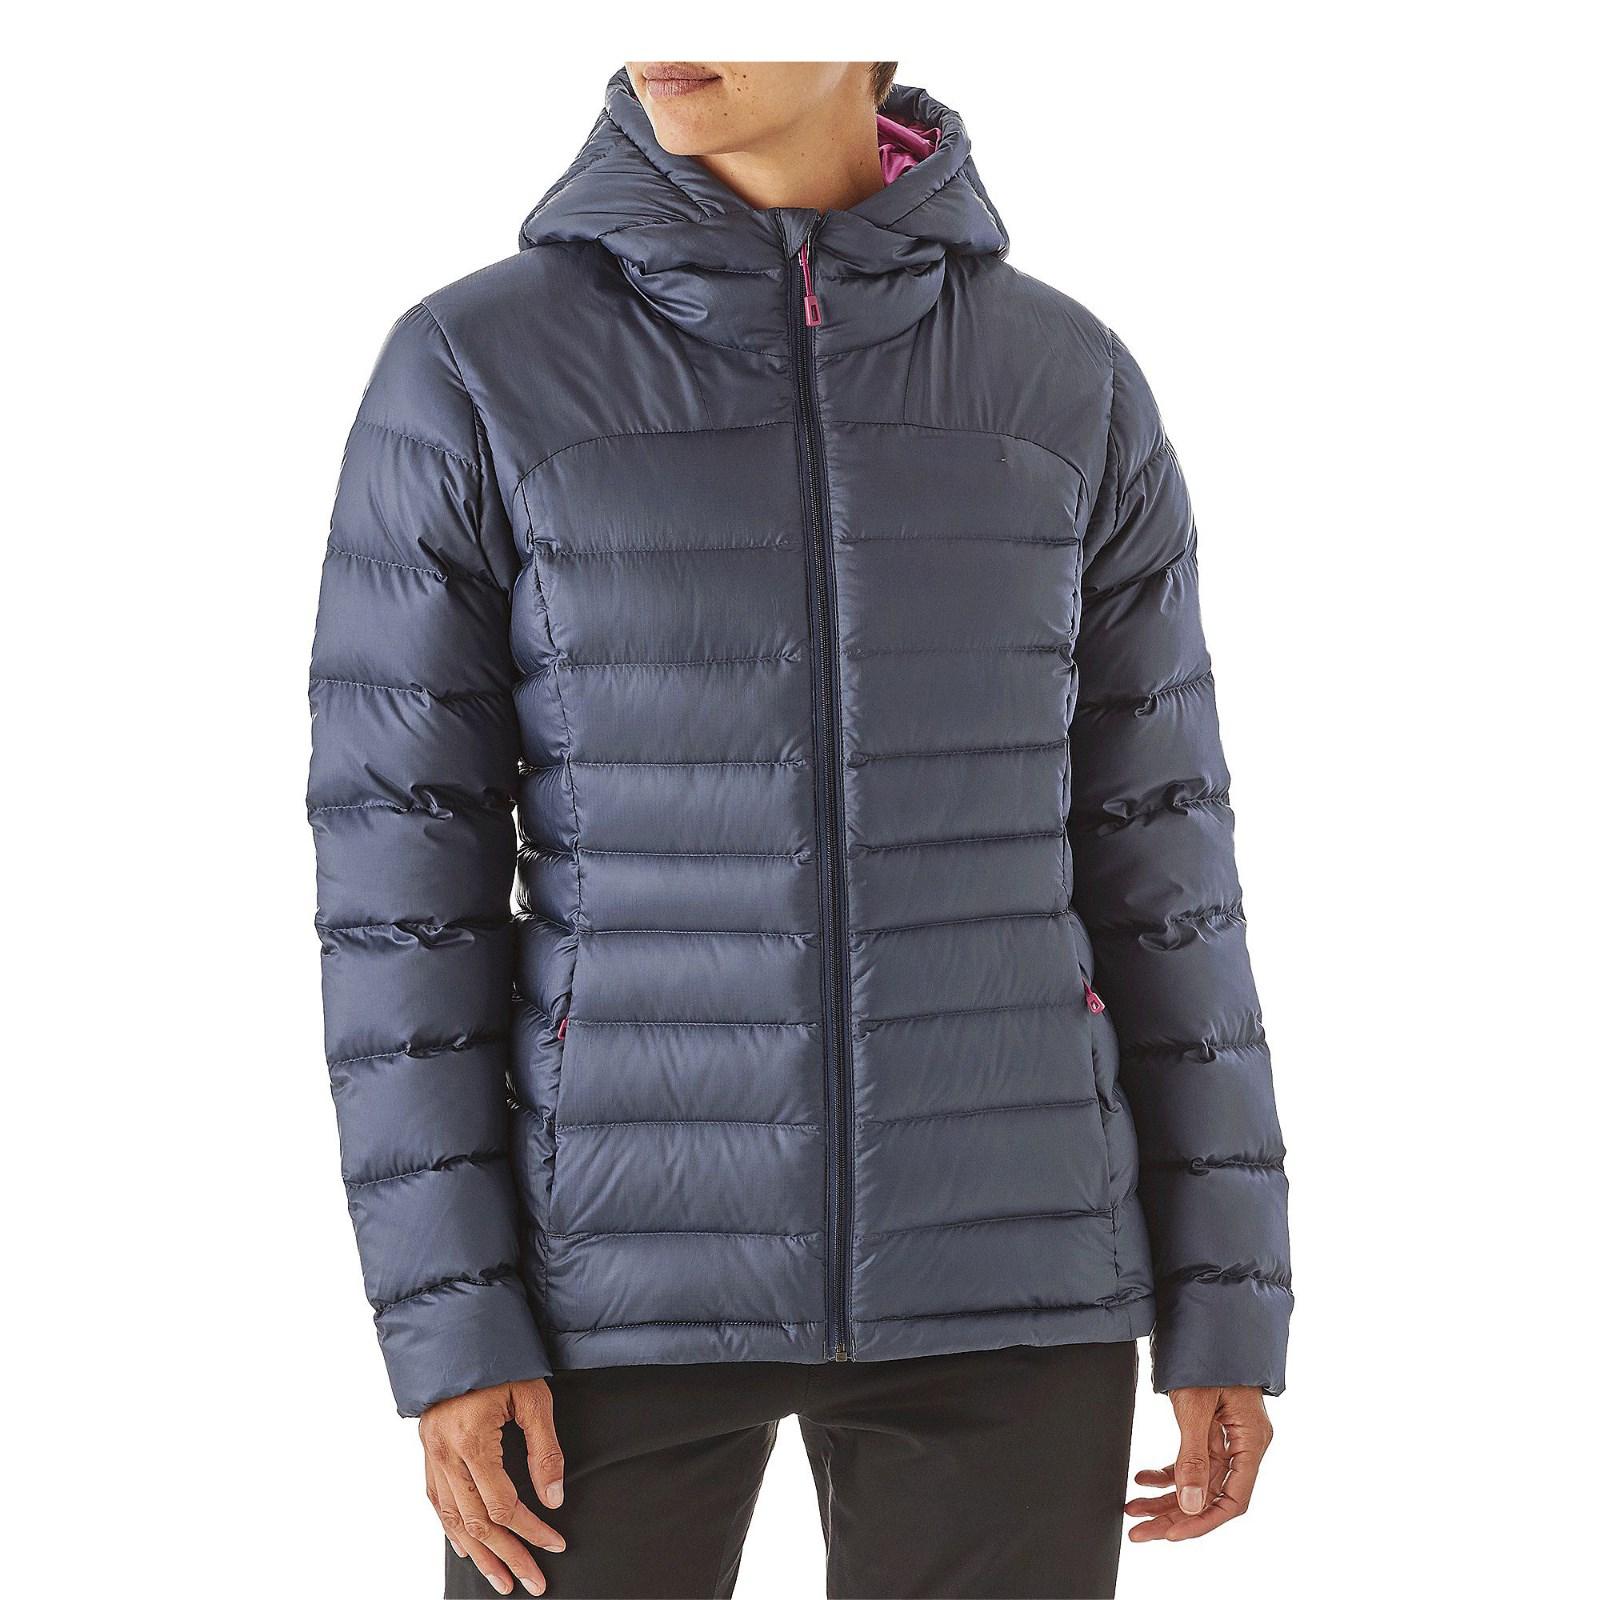 Women's Down Jacket Hoody Manufacturers, Women's Down Jacket Hoody Factory, Supply Women's Down Jacket Hoody